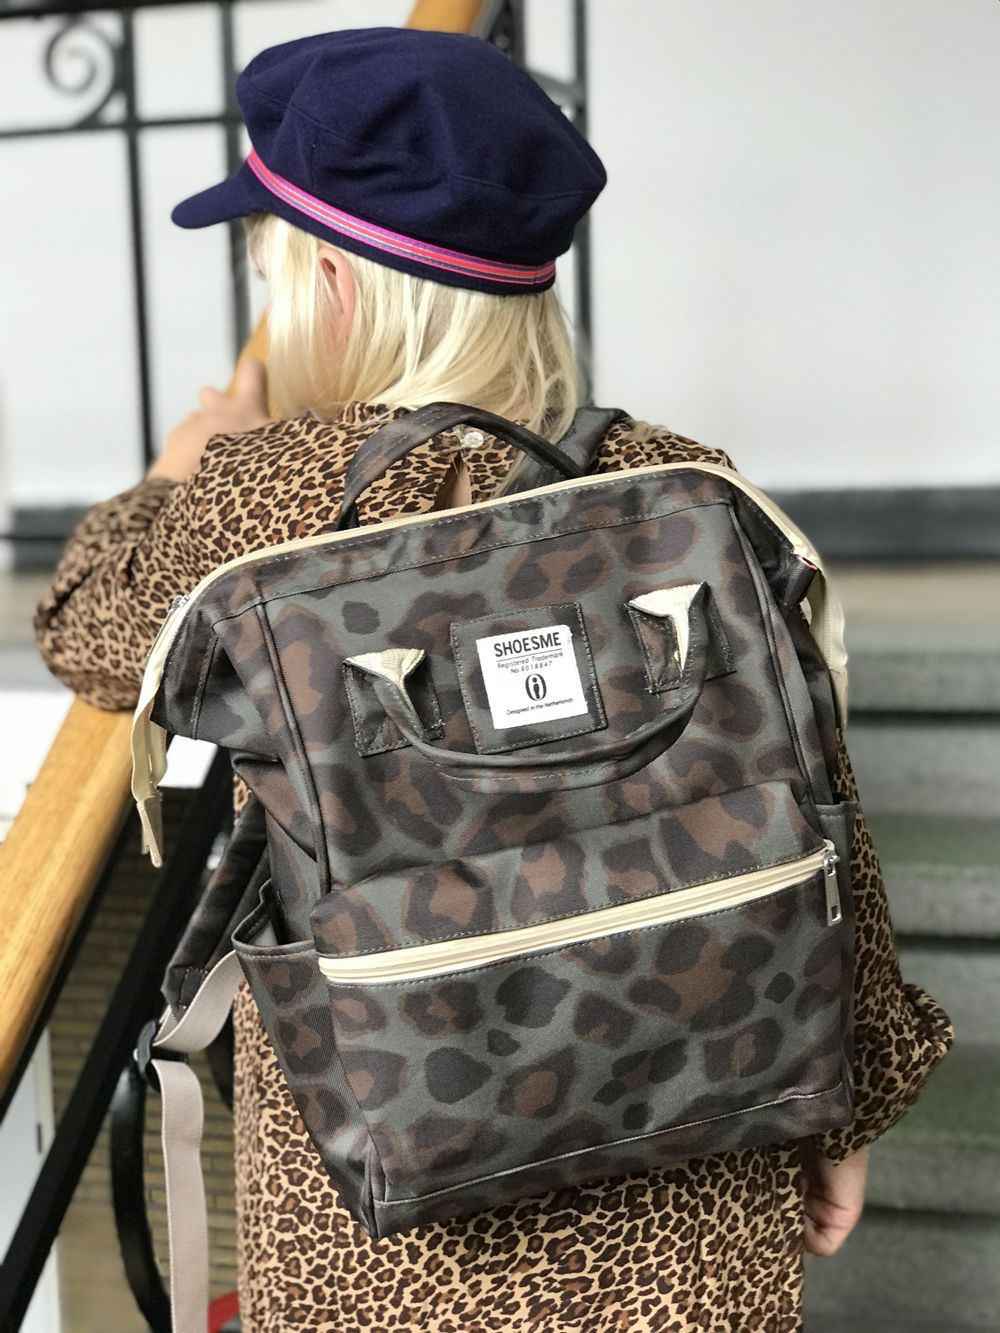 05d0f5215cc schooltas, shoesme rugtas, messenger bag, schooltassen meiden, messenger bag